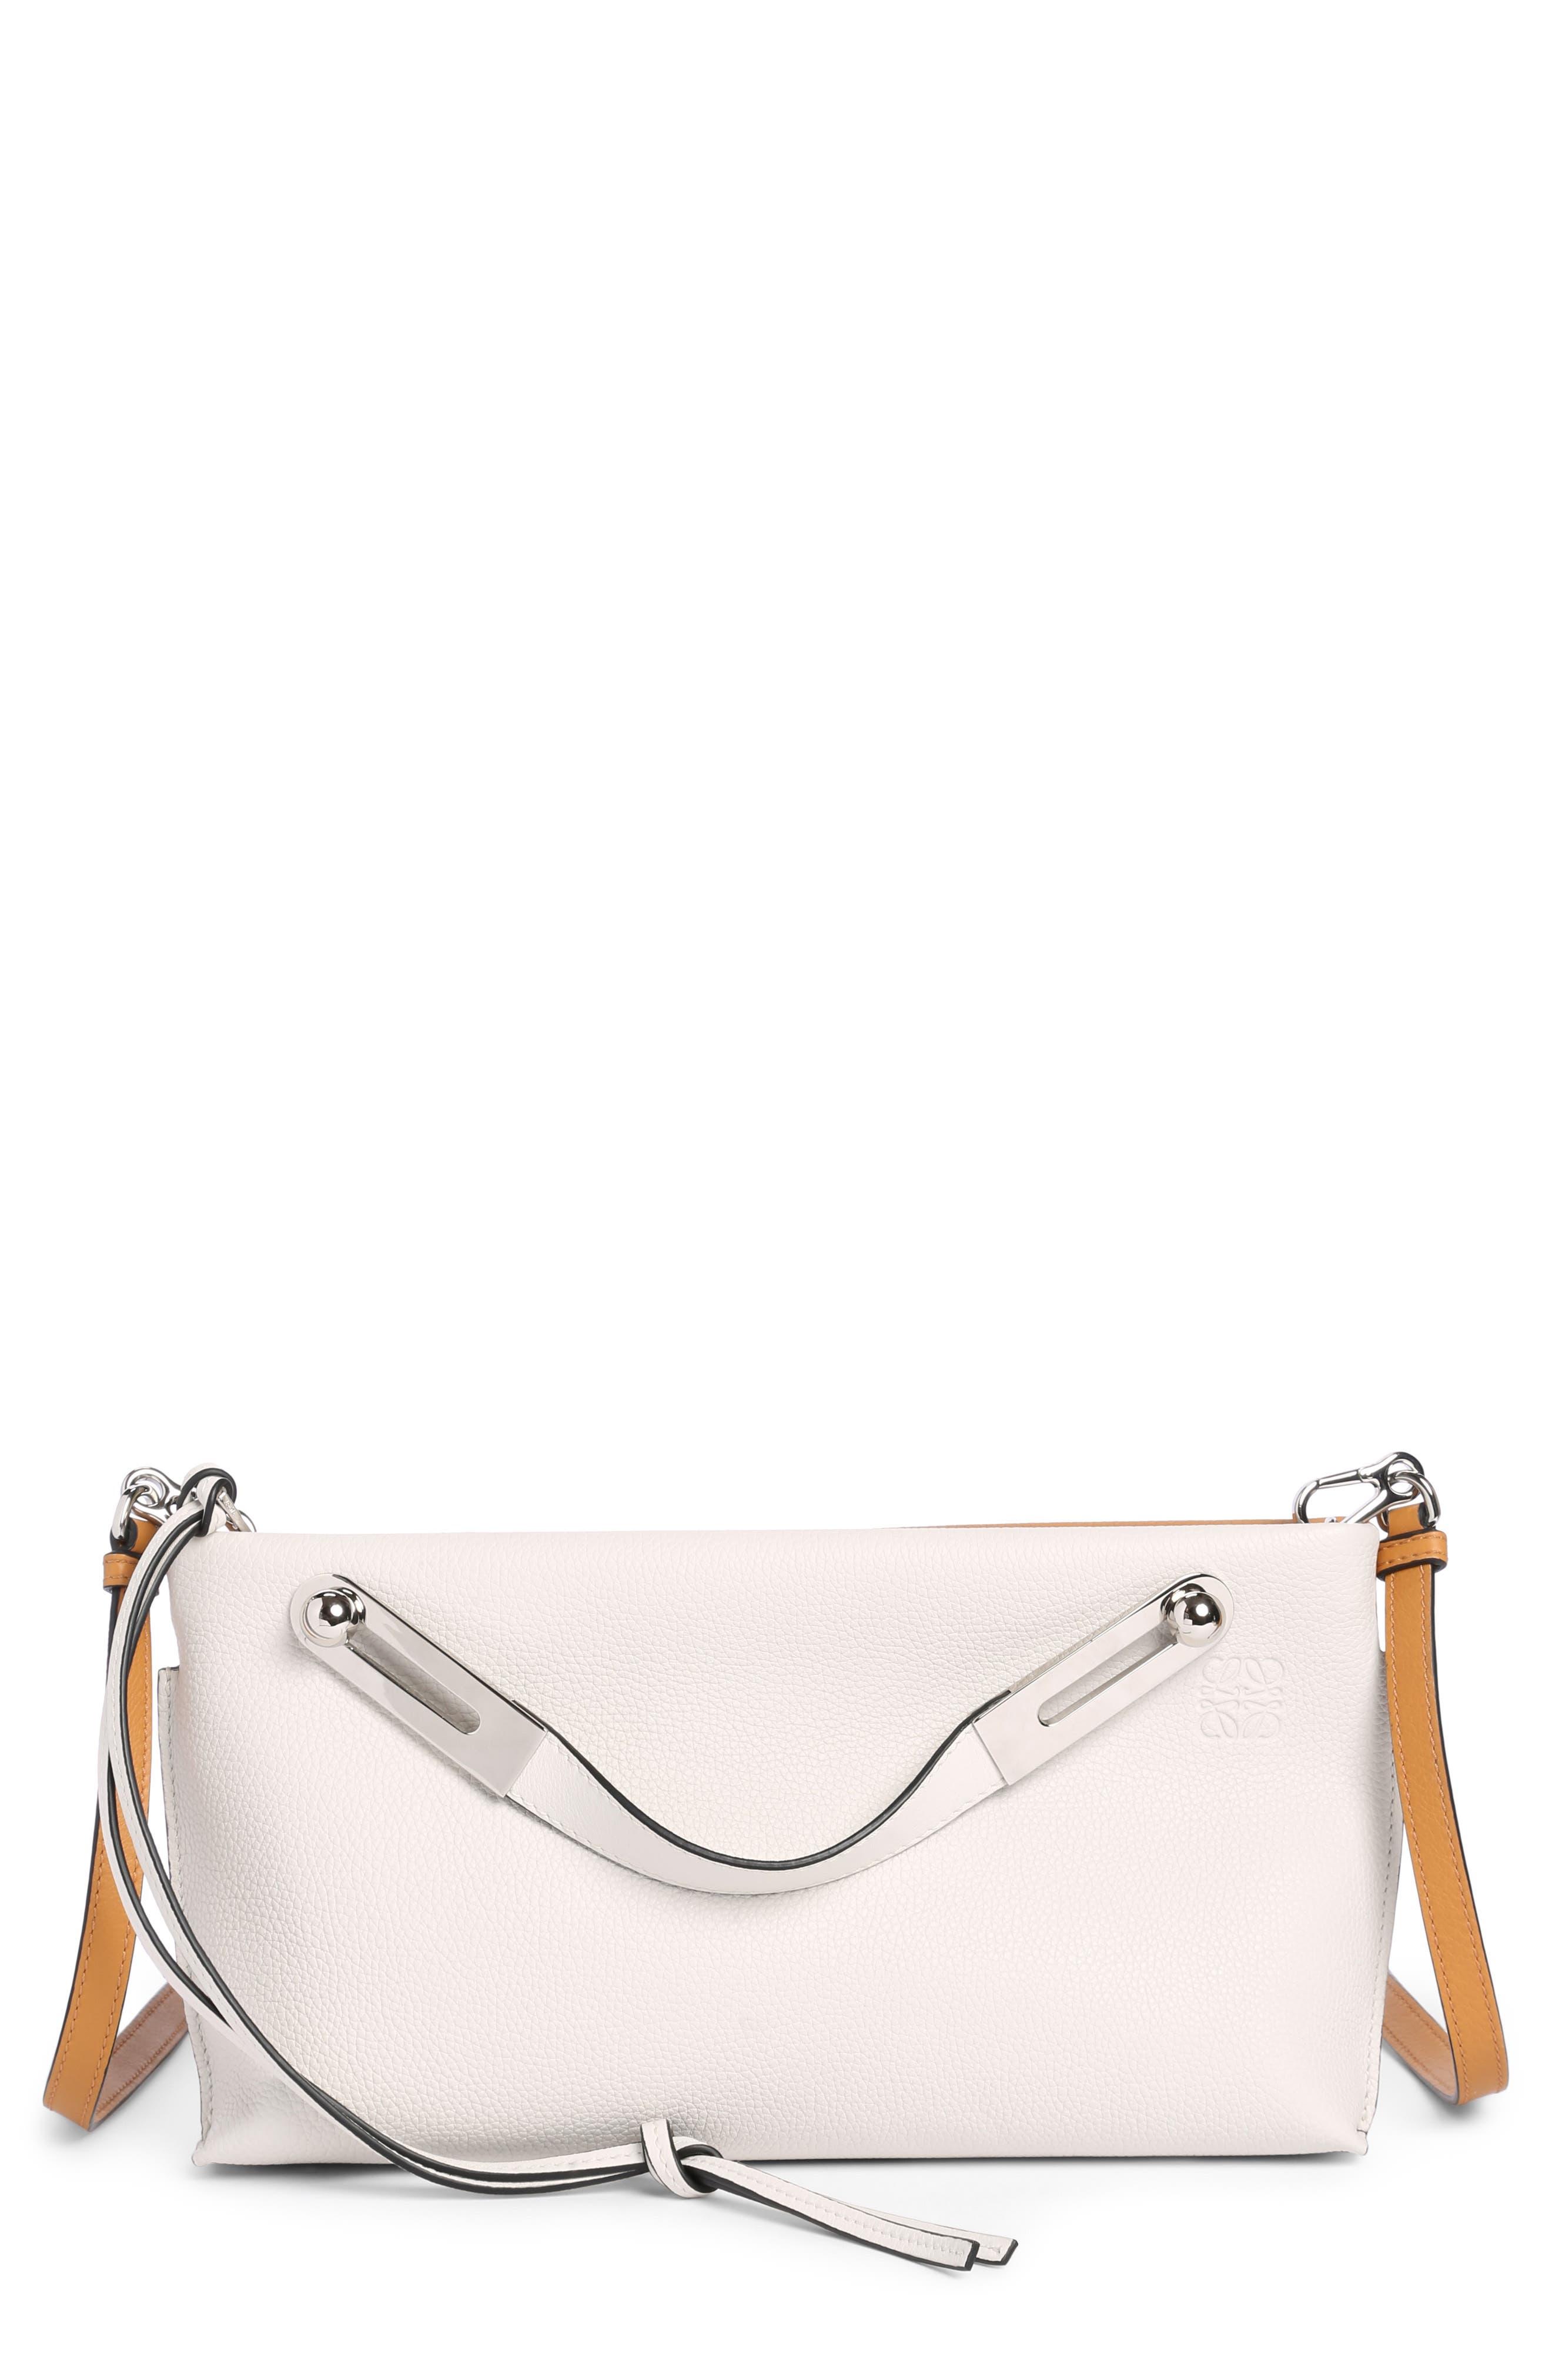 Small Missy Calfskin Leather Crossbody Bag,                             Main thumbnail 1, color,                             141